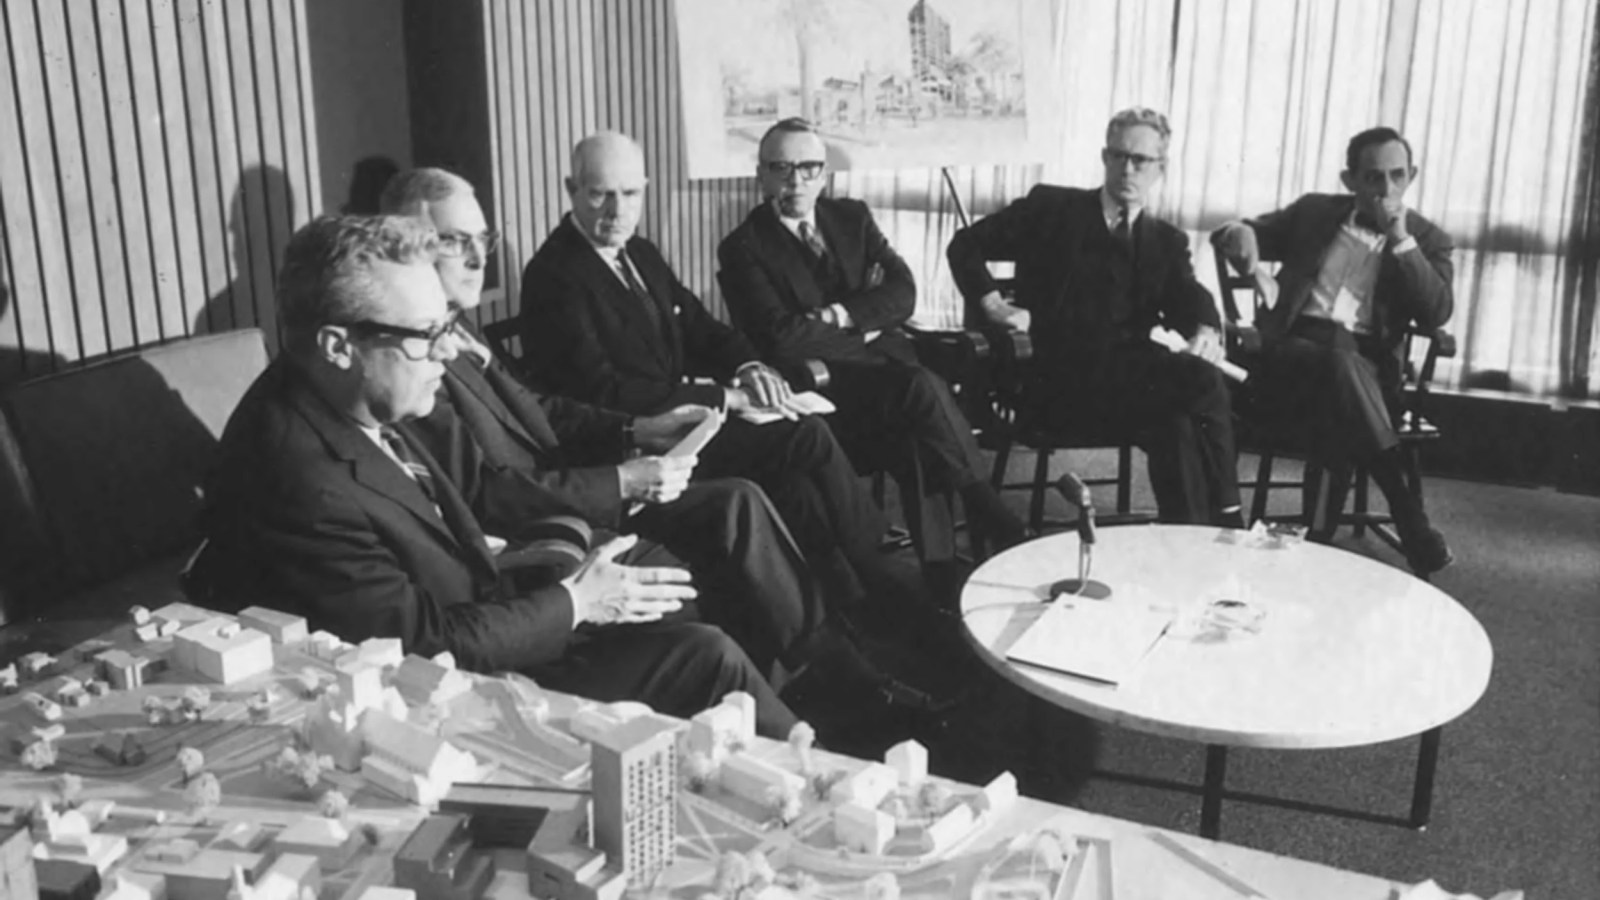 Press conference for A Major Science Program for Harvard College, Nov. 8, 1967.